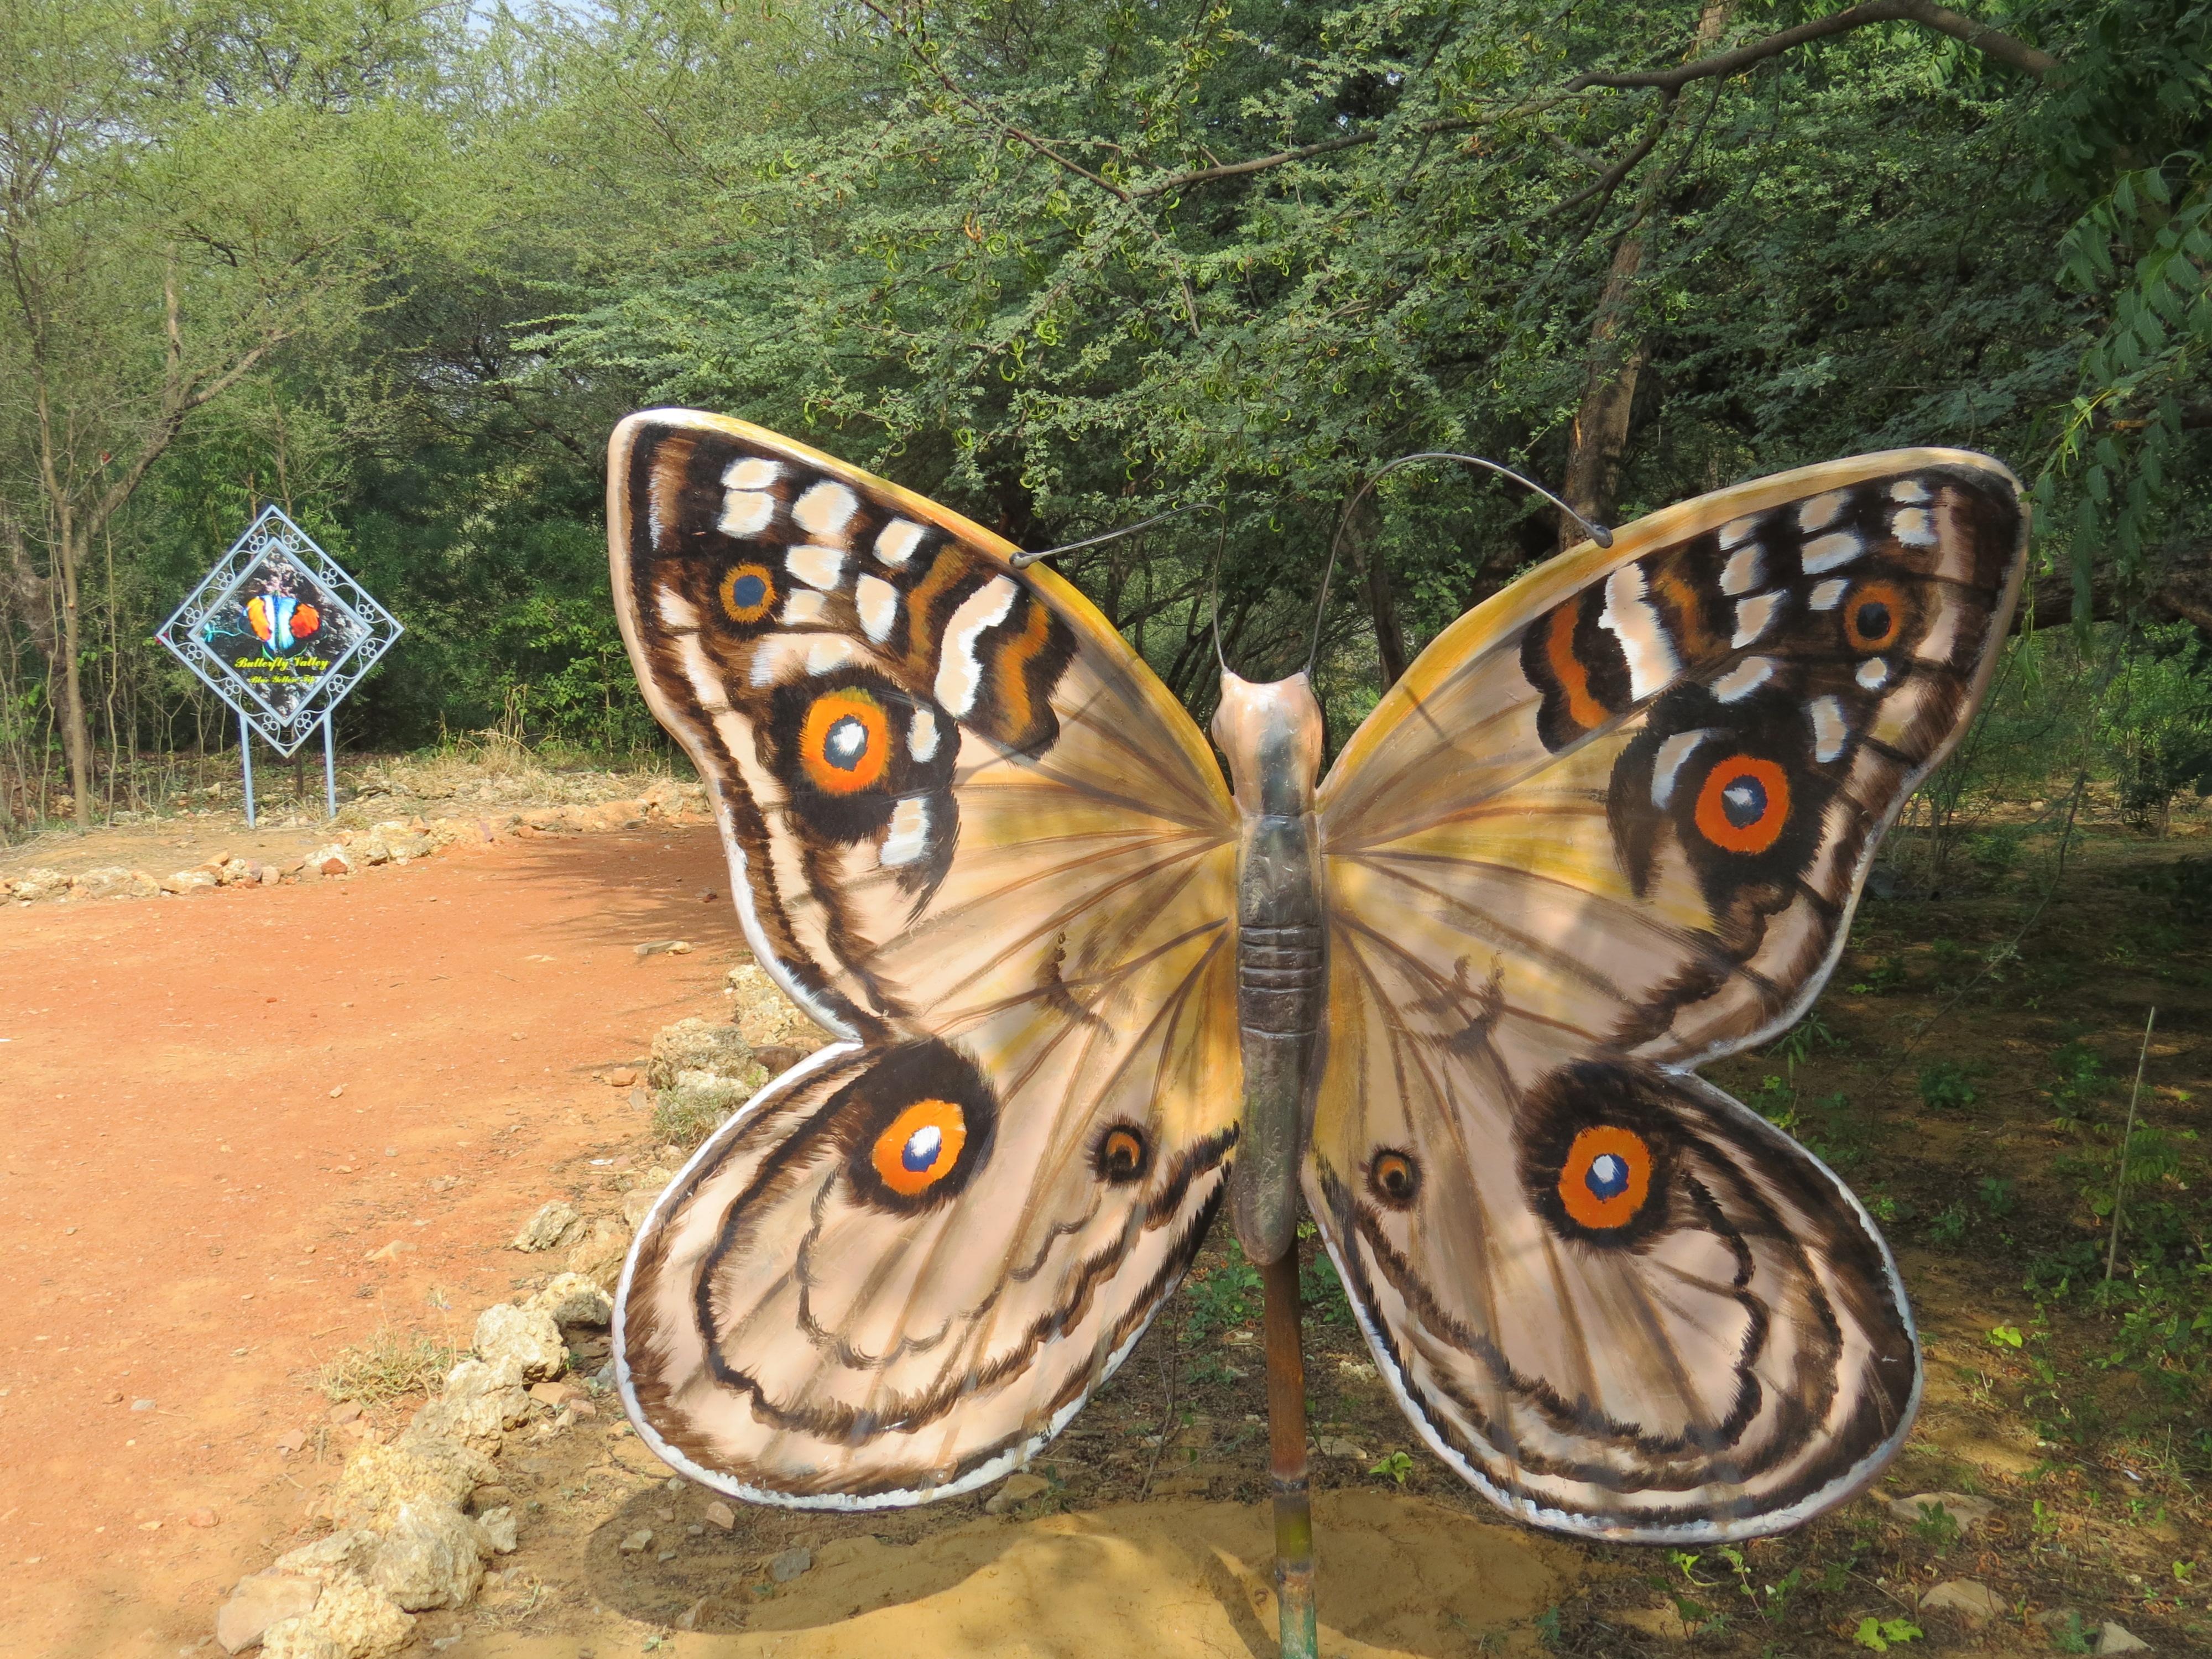 Butterfly valley in Simriti Ban,JLN Marg,Jaipur